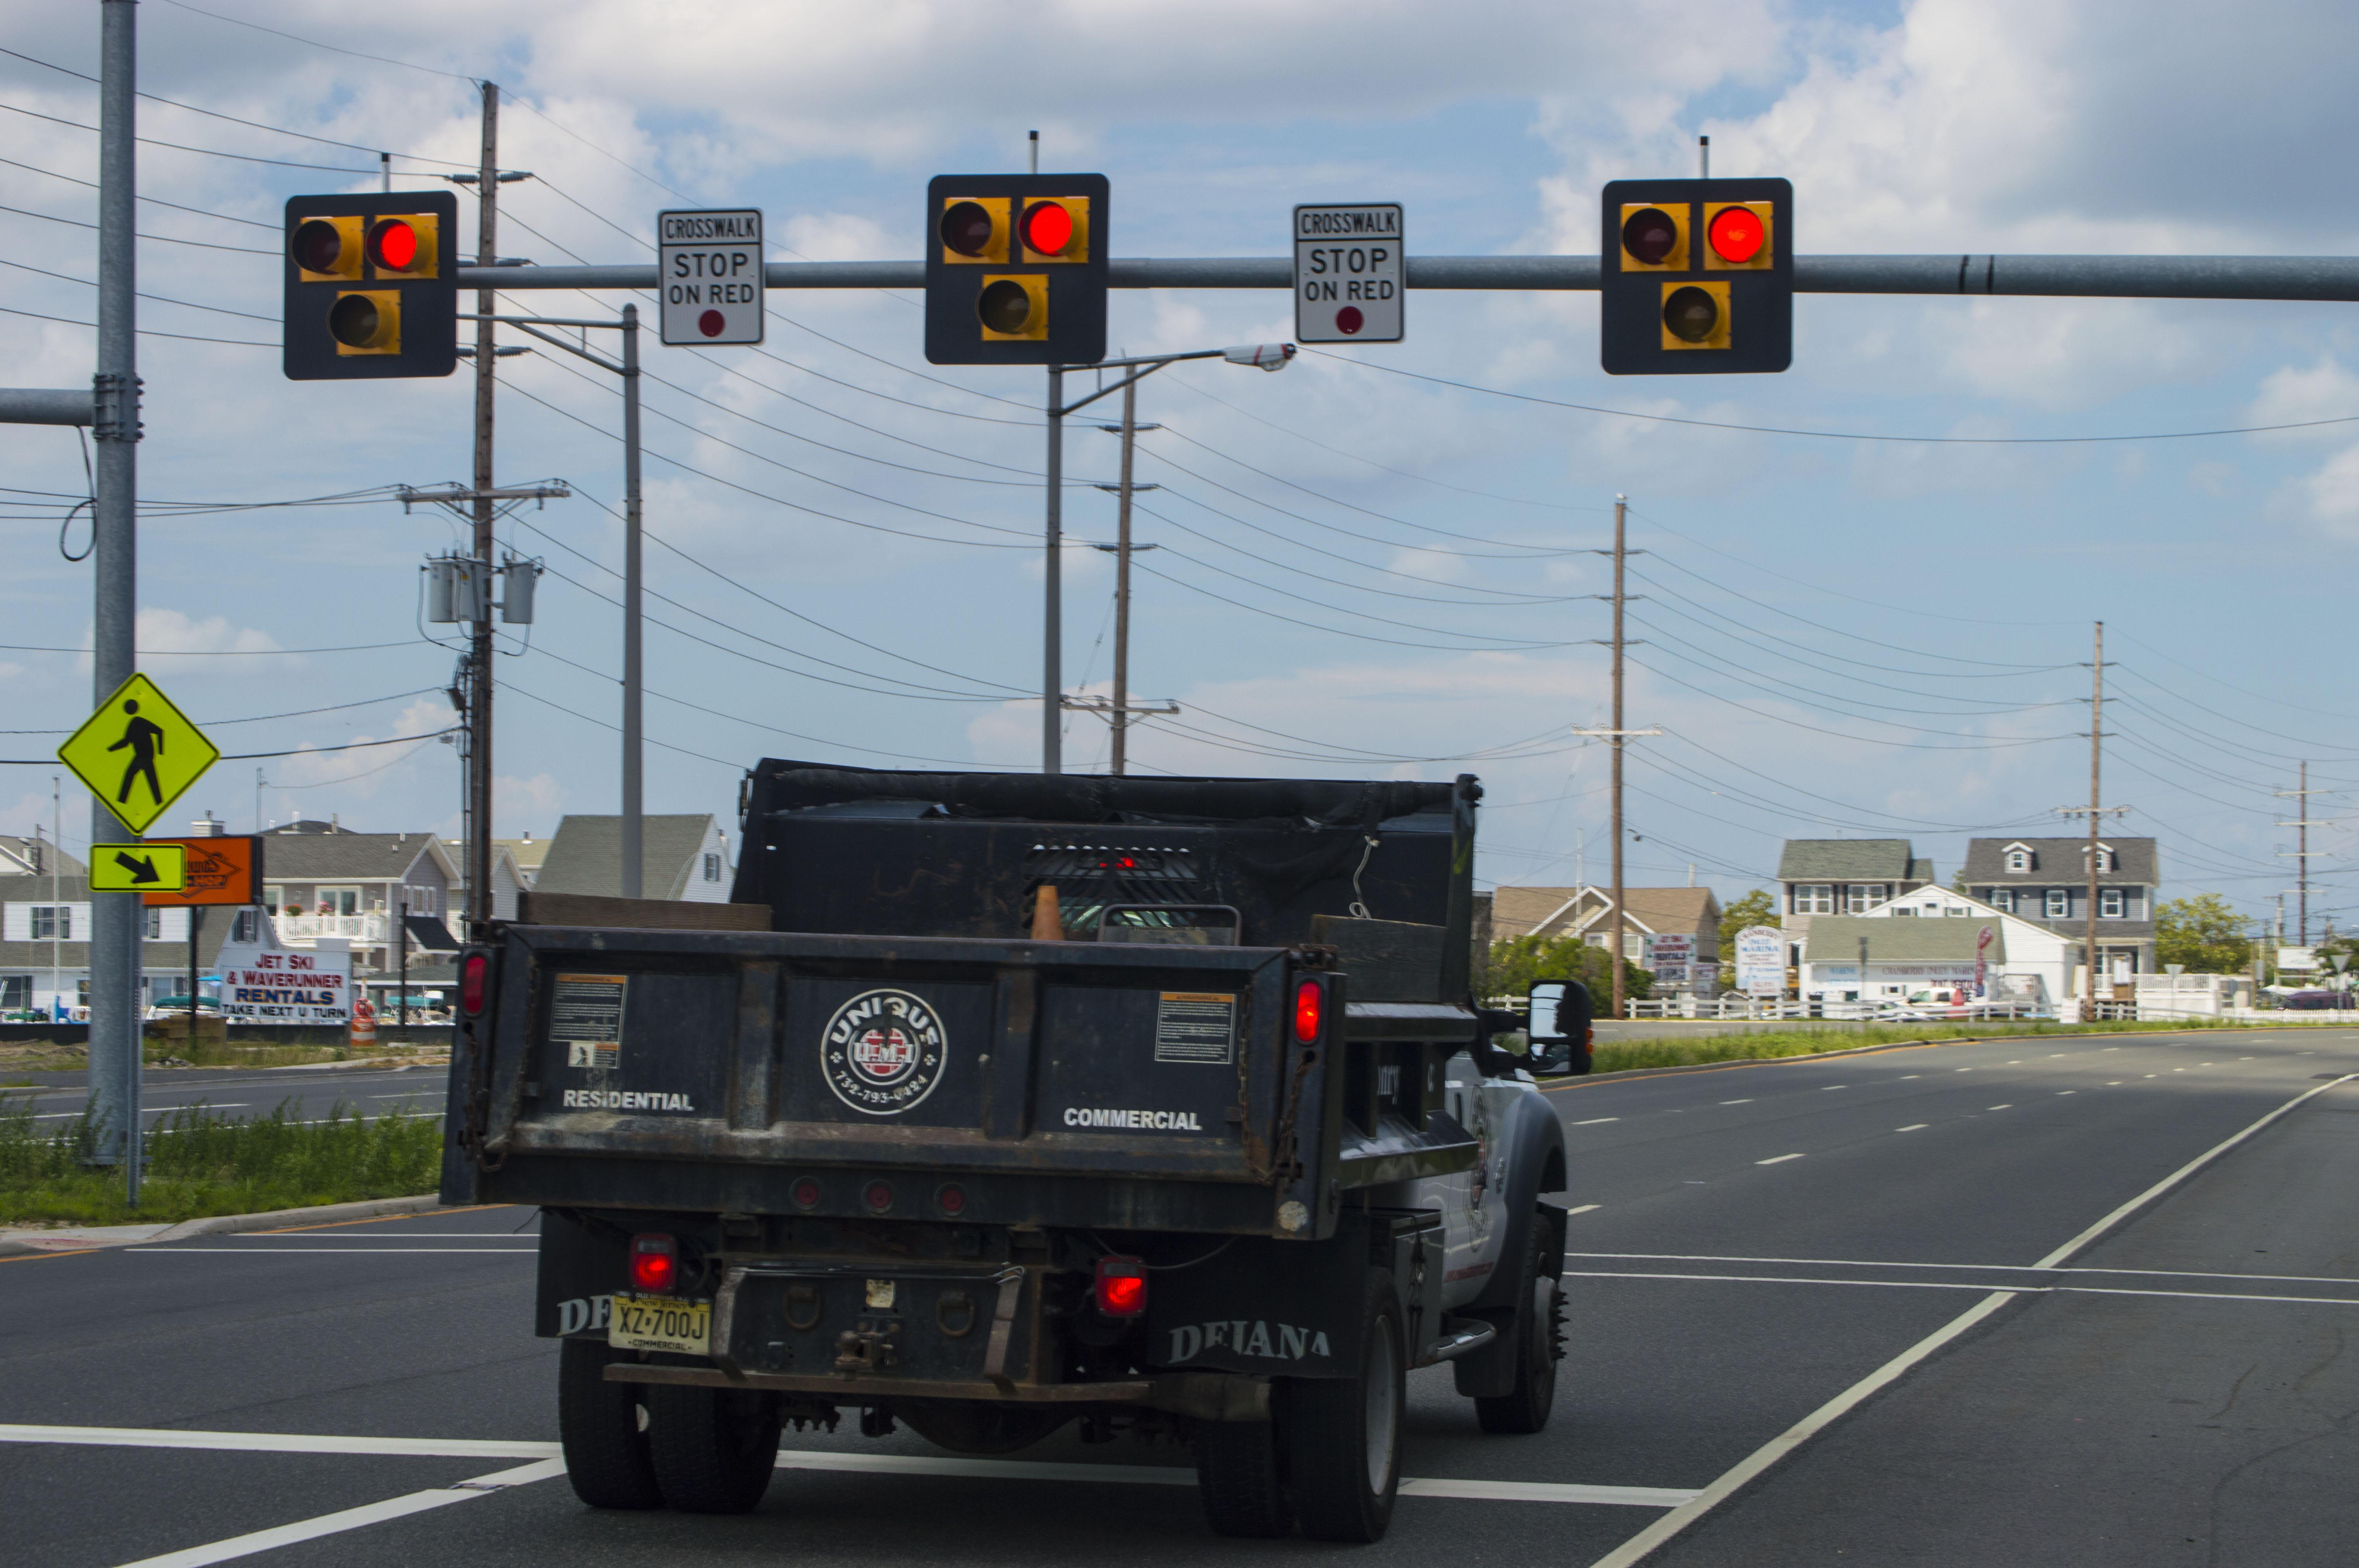 A HAWK traffic signal in Seaside Heights, NJ. (Photo: Daniel Nee)